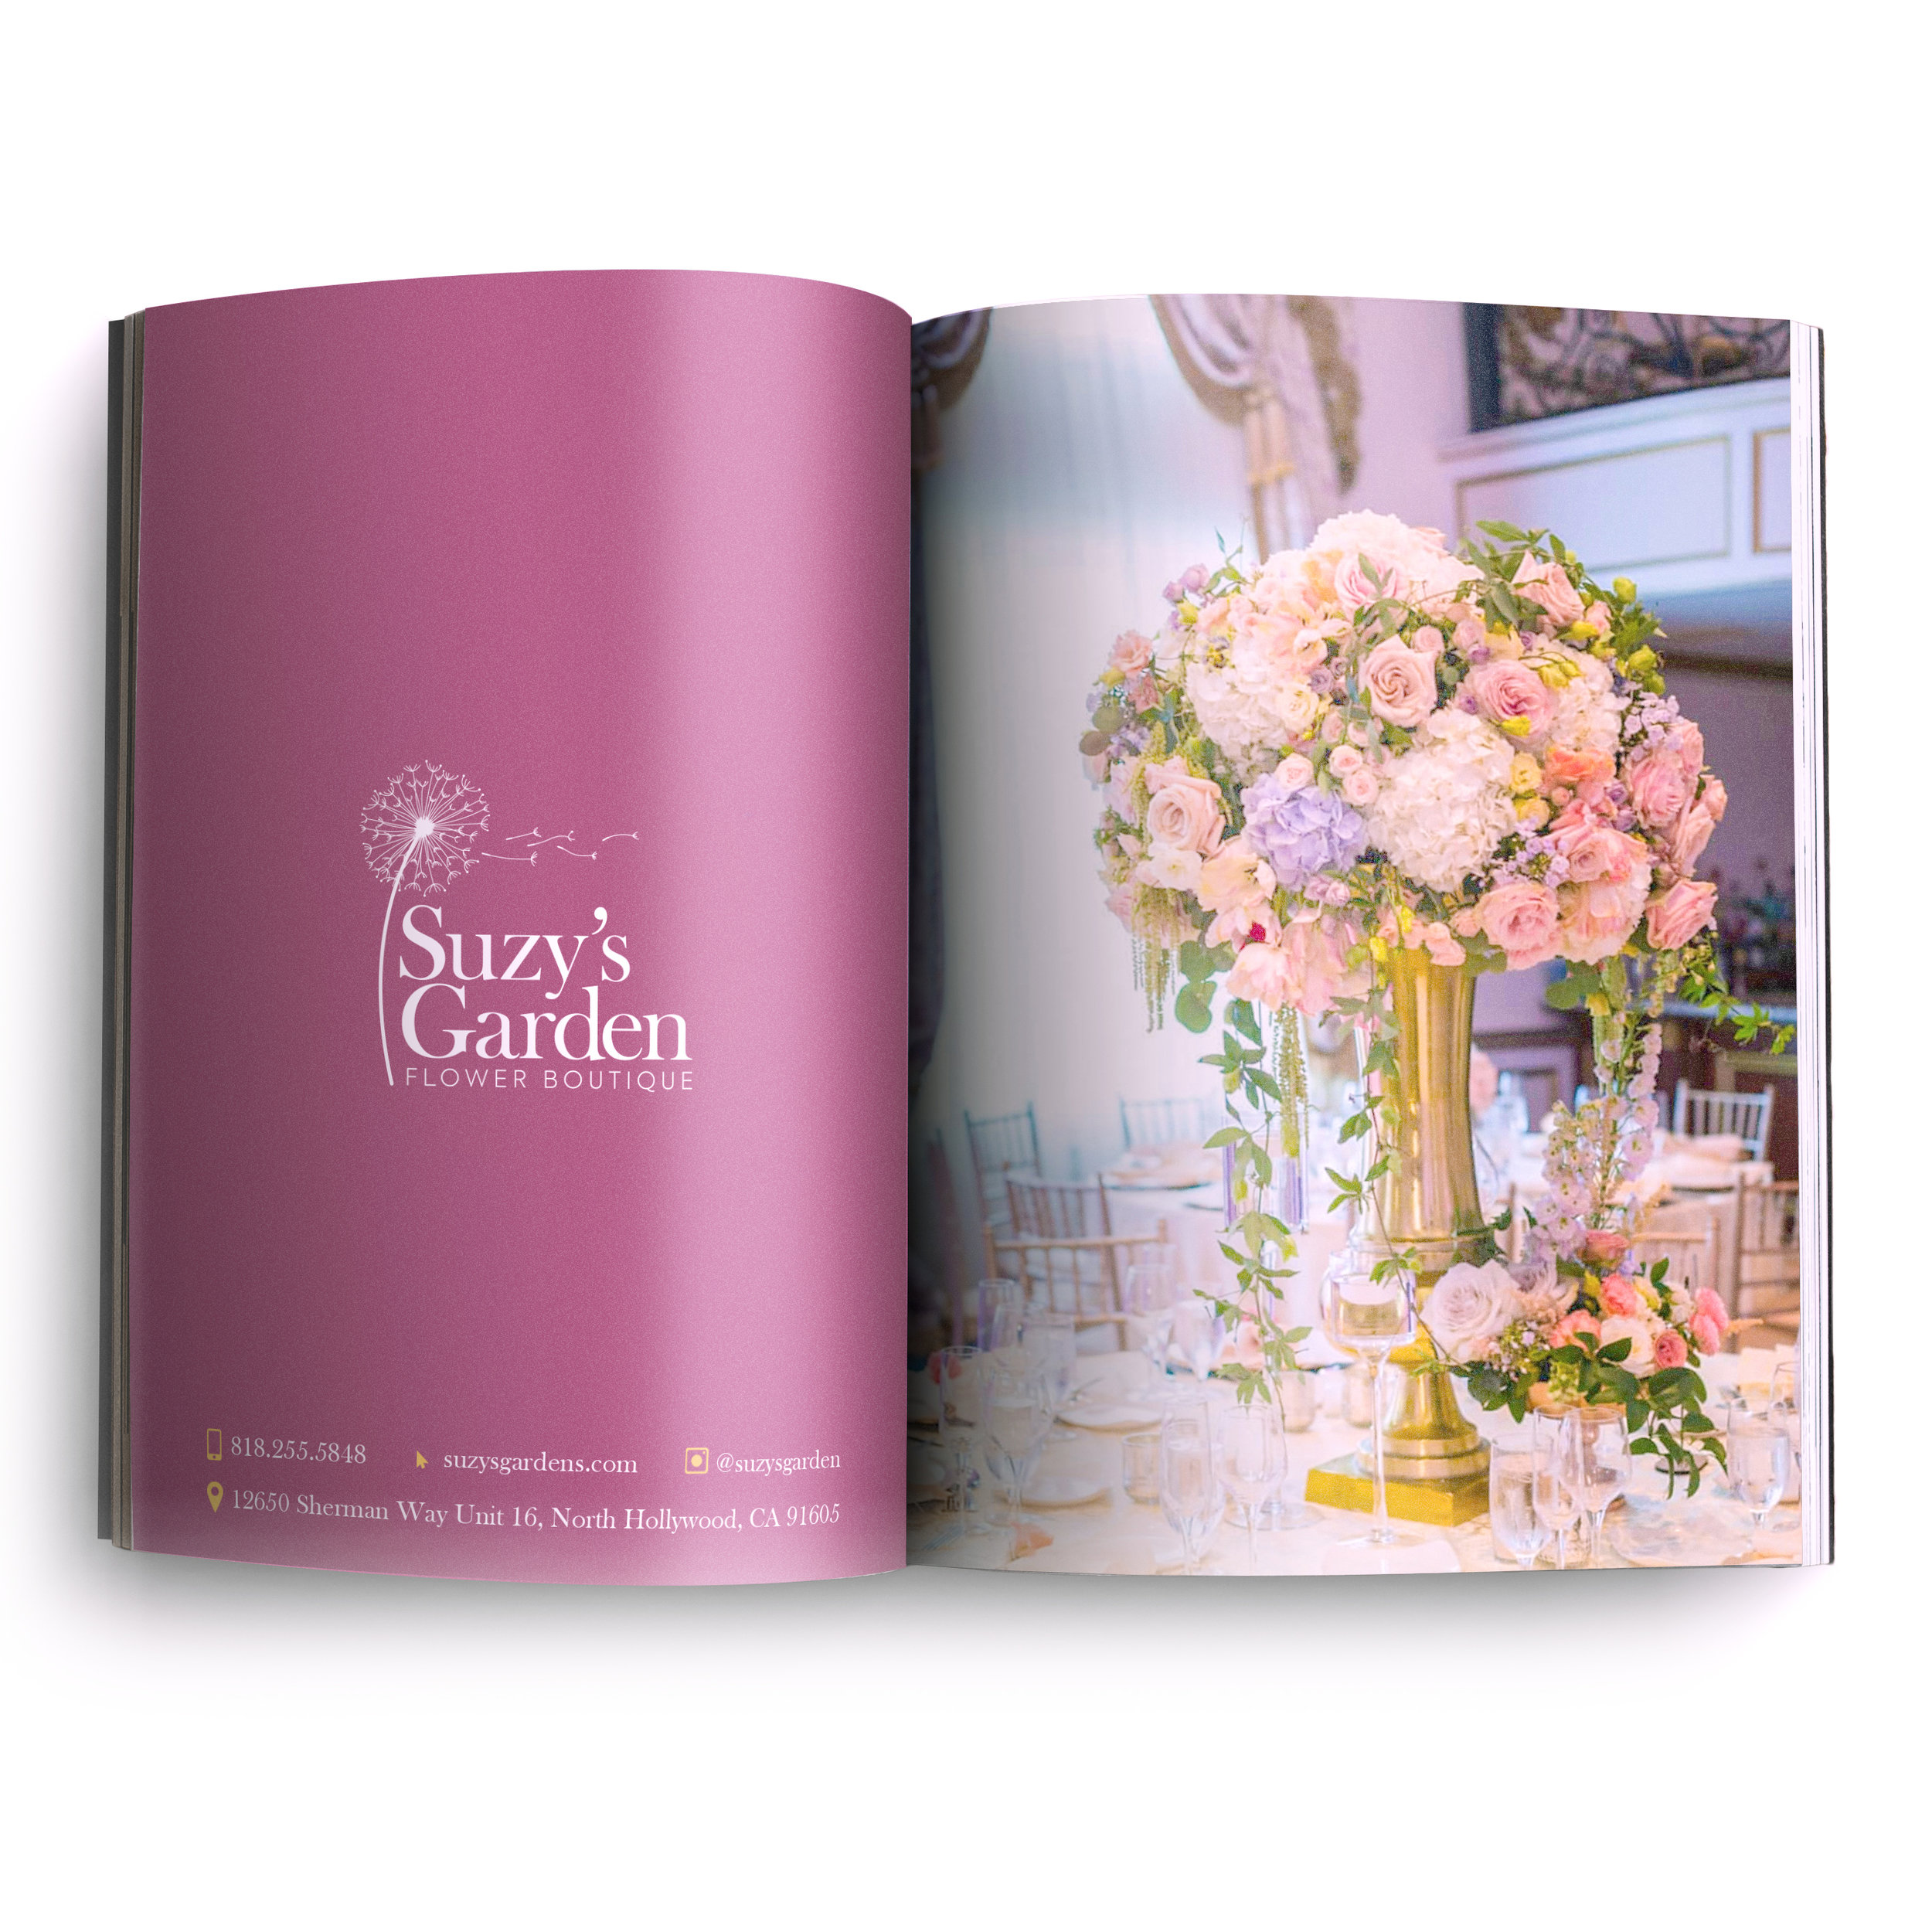 Suzy's Garden - Los Angeles based flower shop.